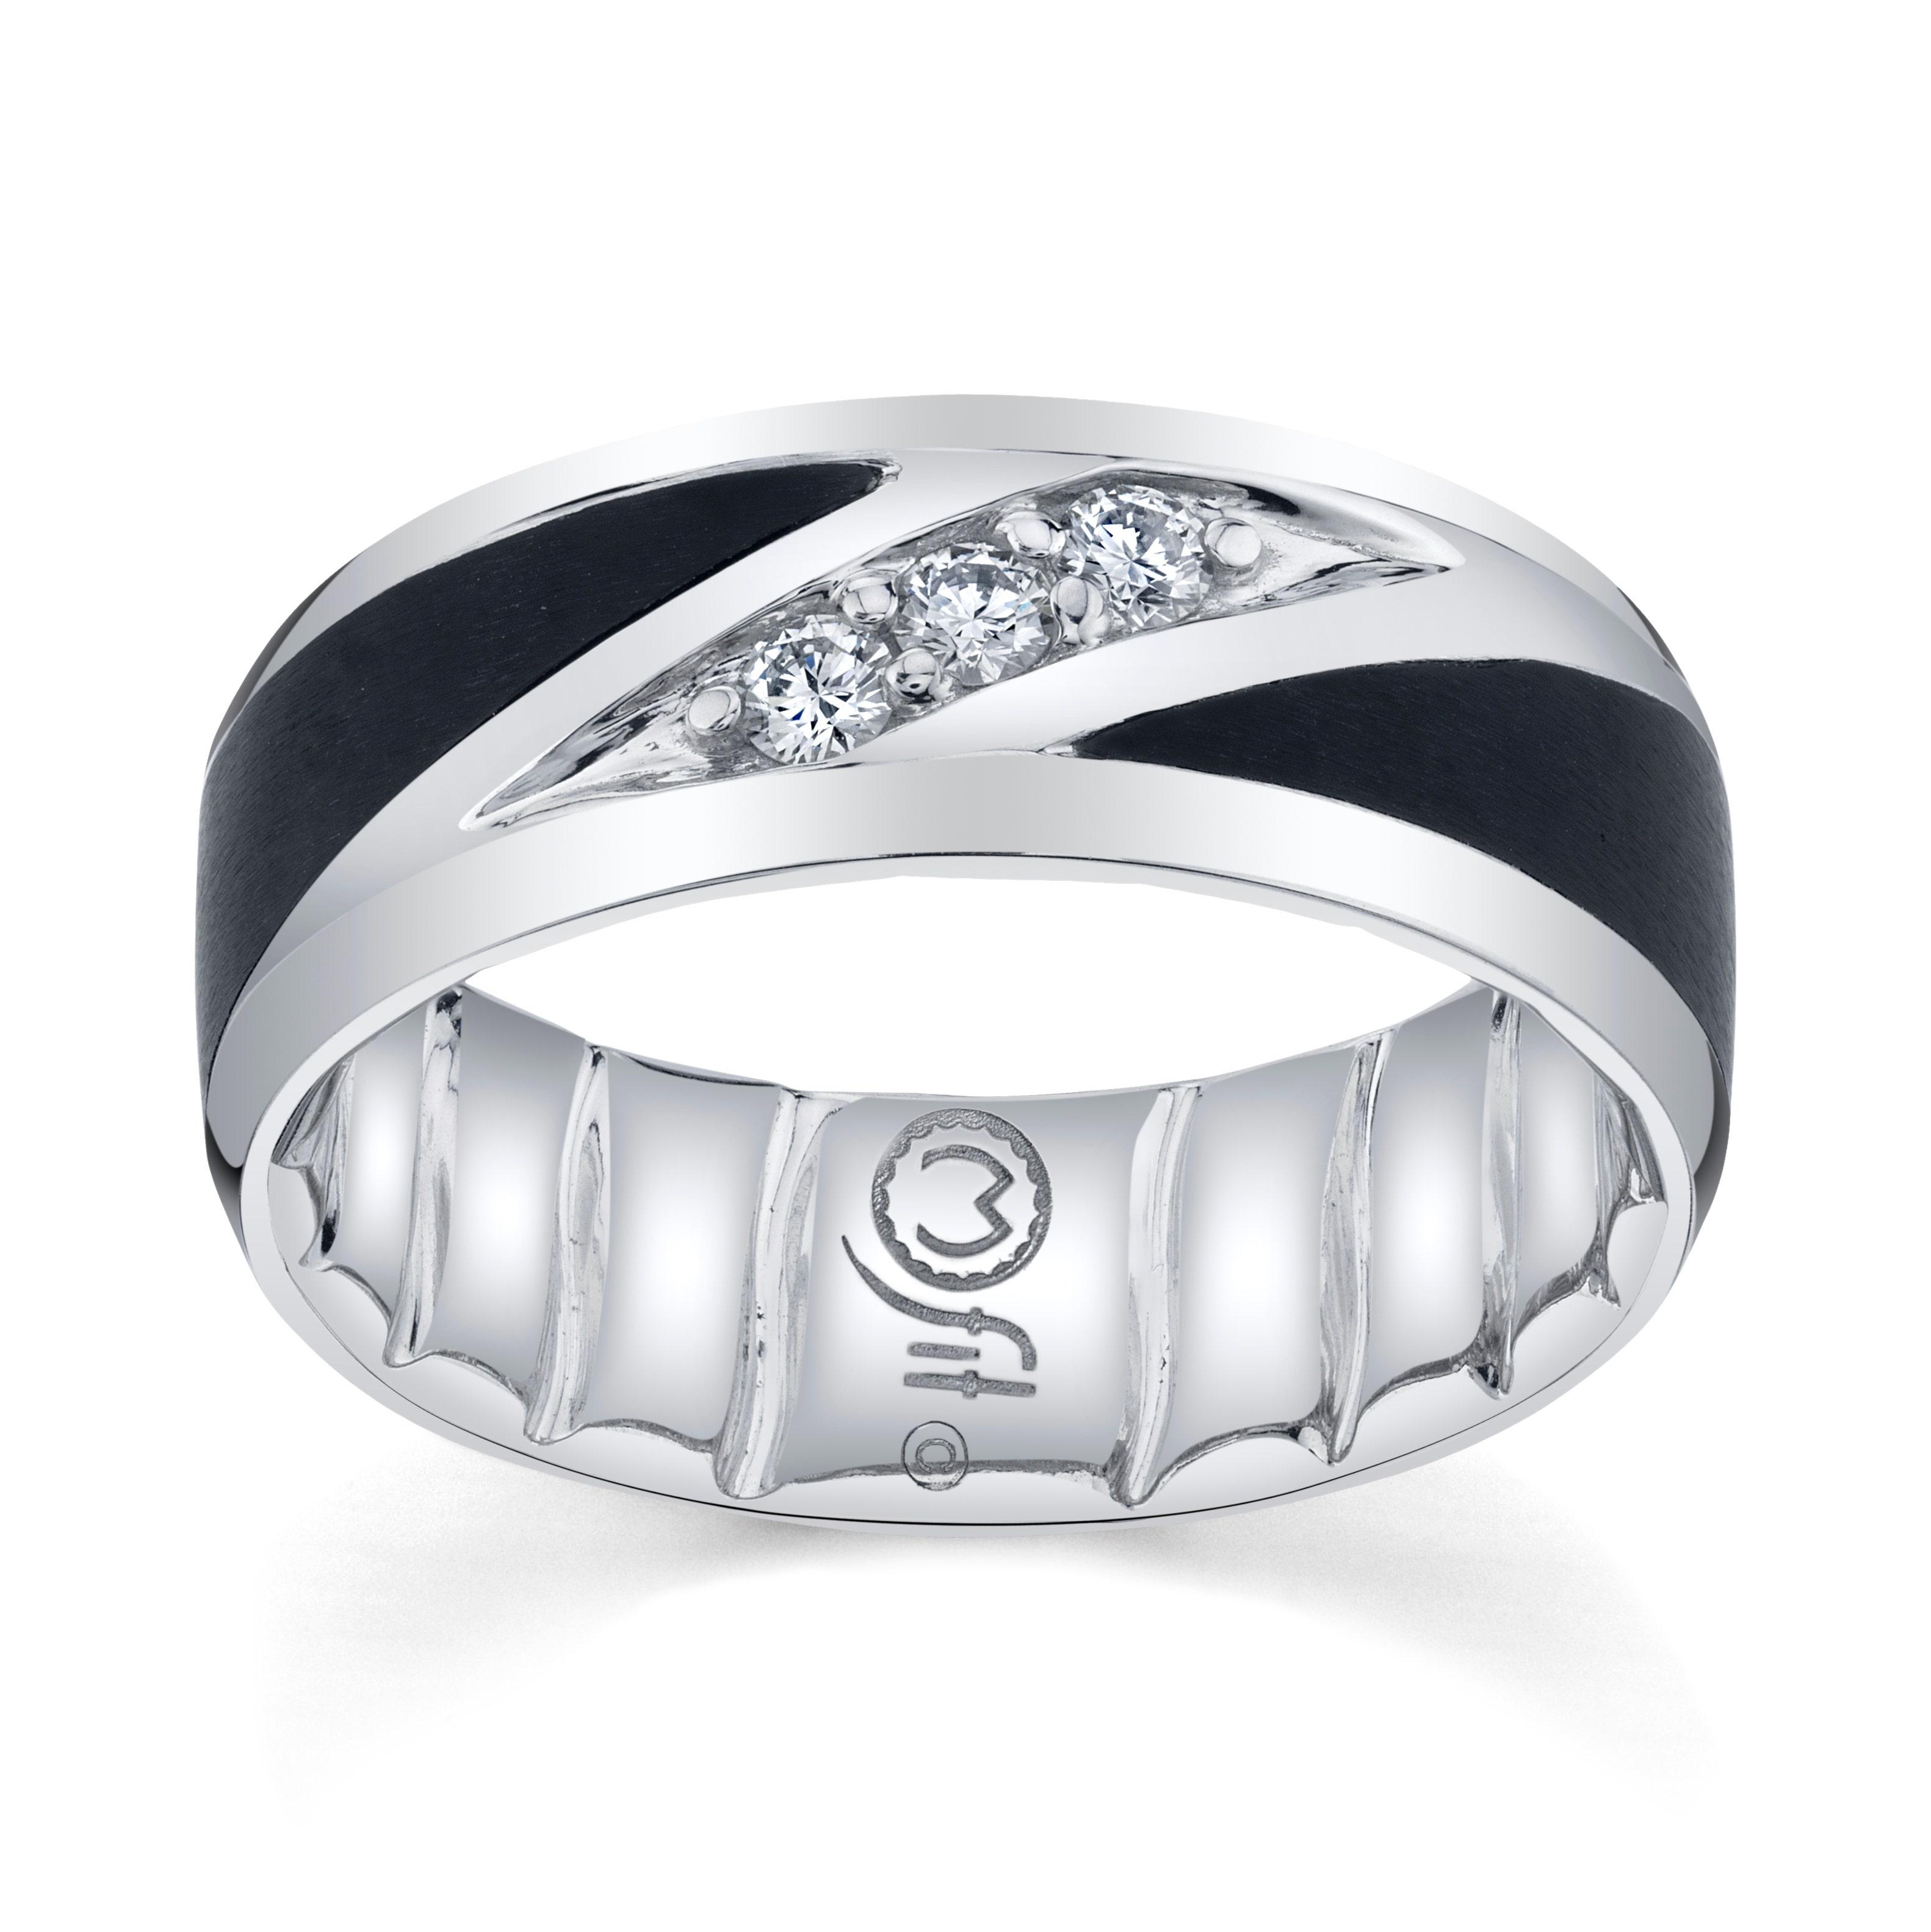 Comfort Fit Ring Classic Ring Diamond Wedding Band Couple Ring Gift Ring Modern Ring Round Black Ceramic Ring Stylish Ring